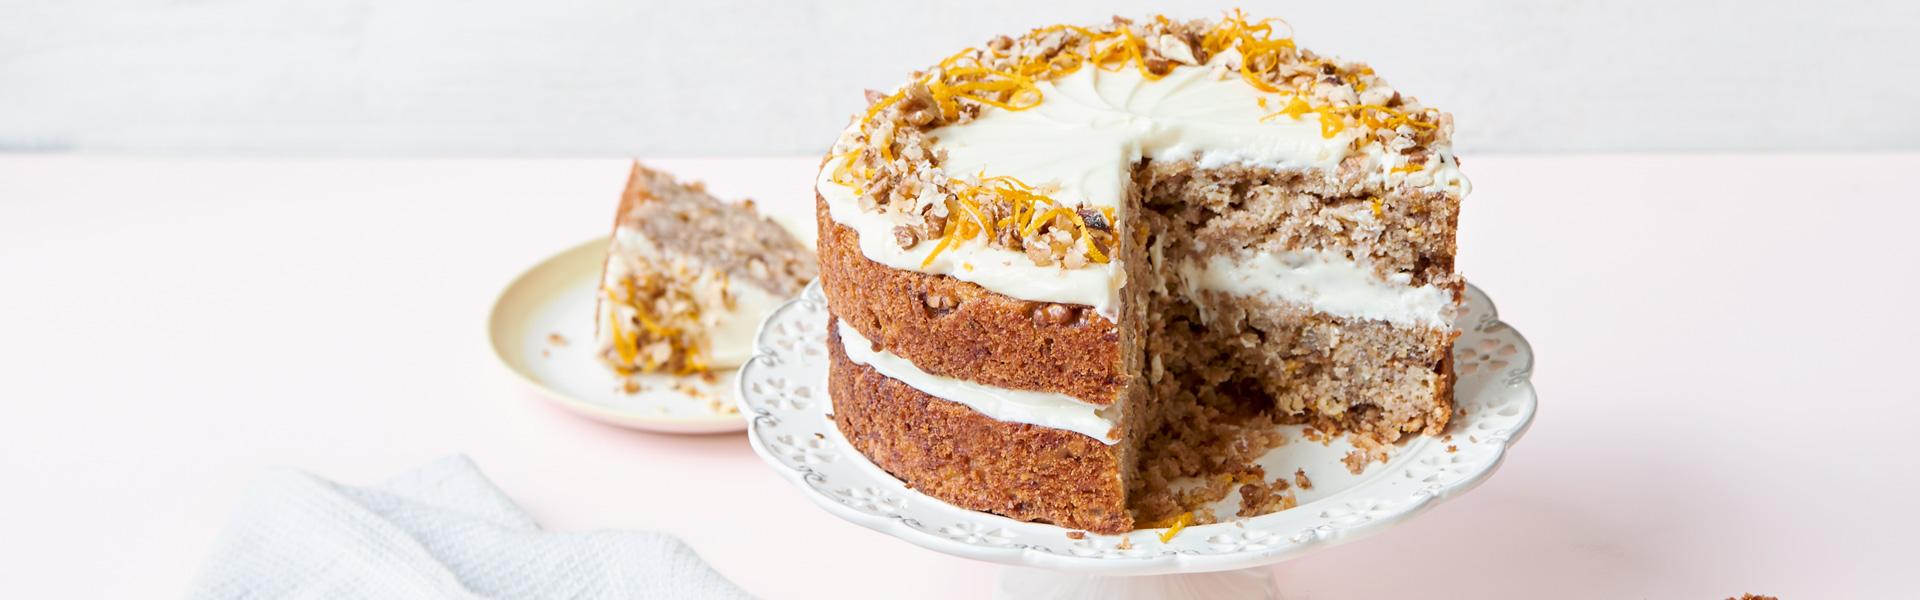 Nadiya Hussain: Parsnip and Orange Spiced Cake